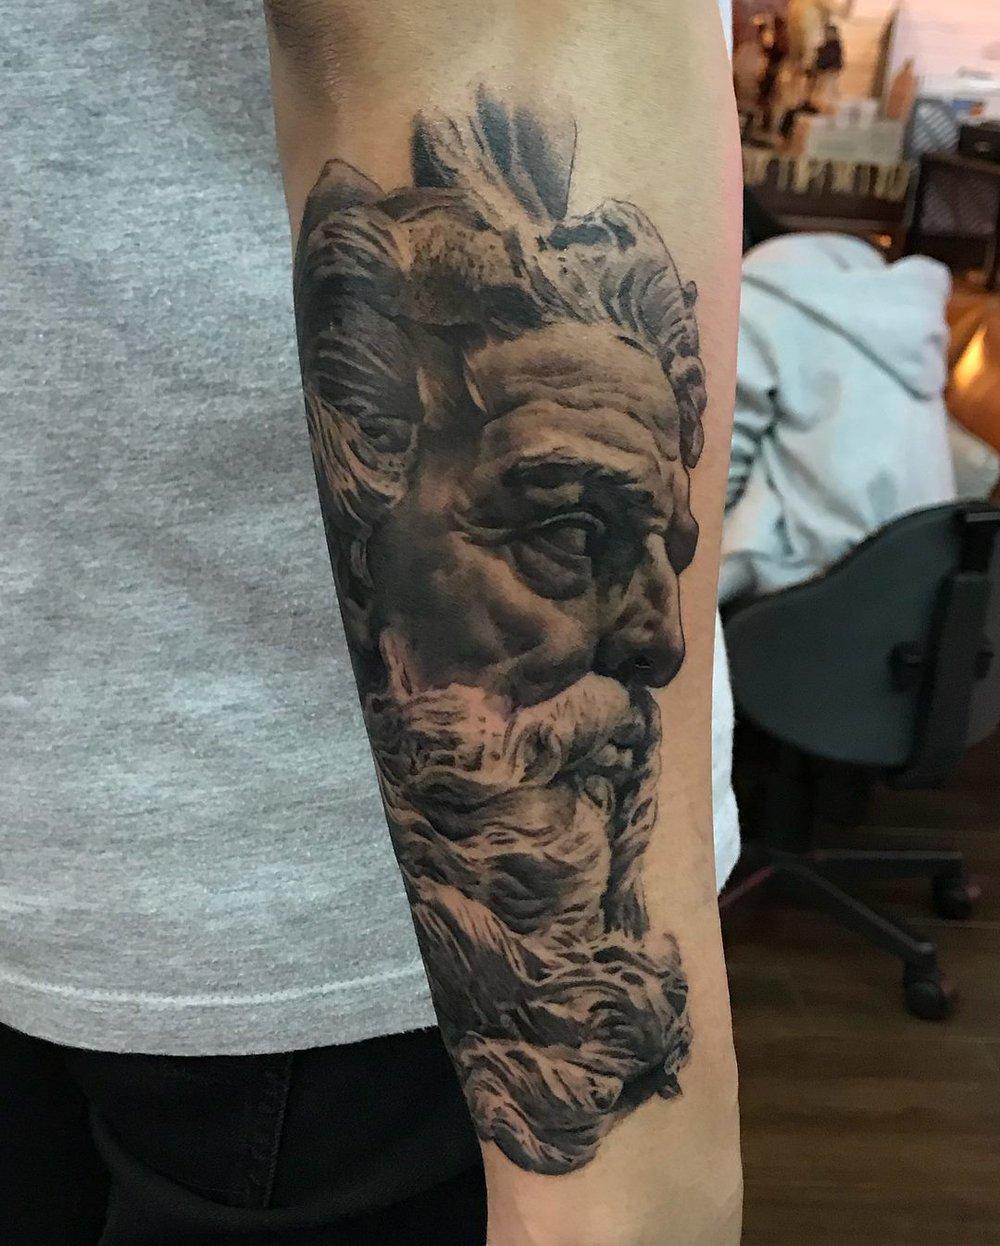 2018-fridays-tattoo-hong-kong-jamie-realistic-statue-2.jpg